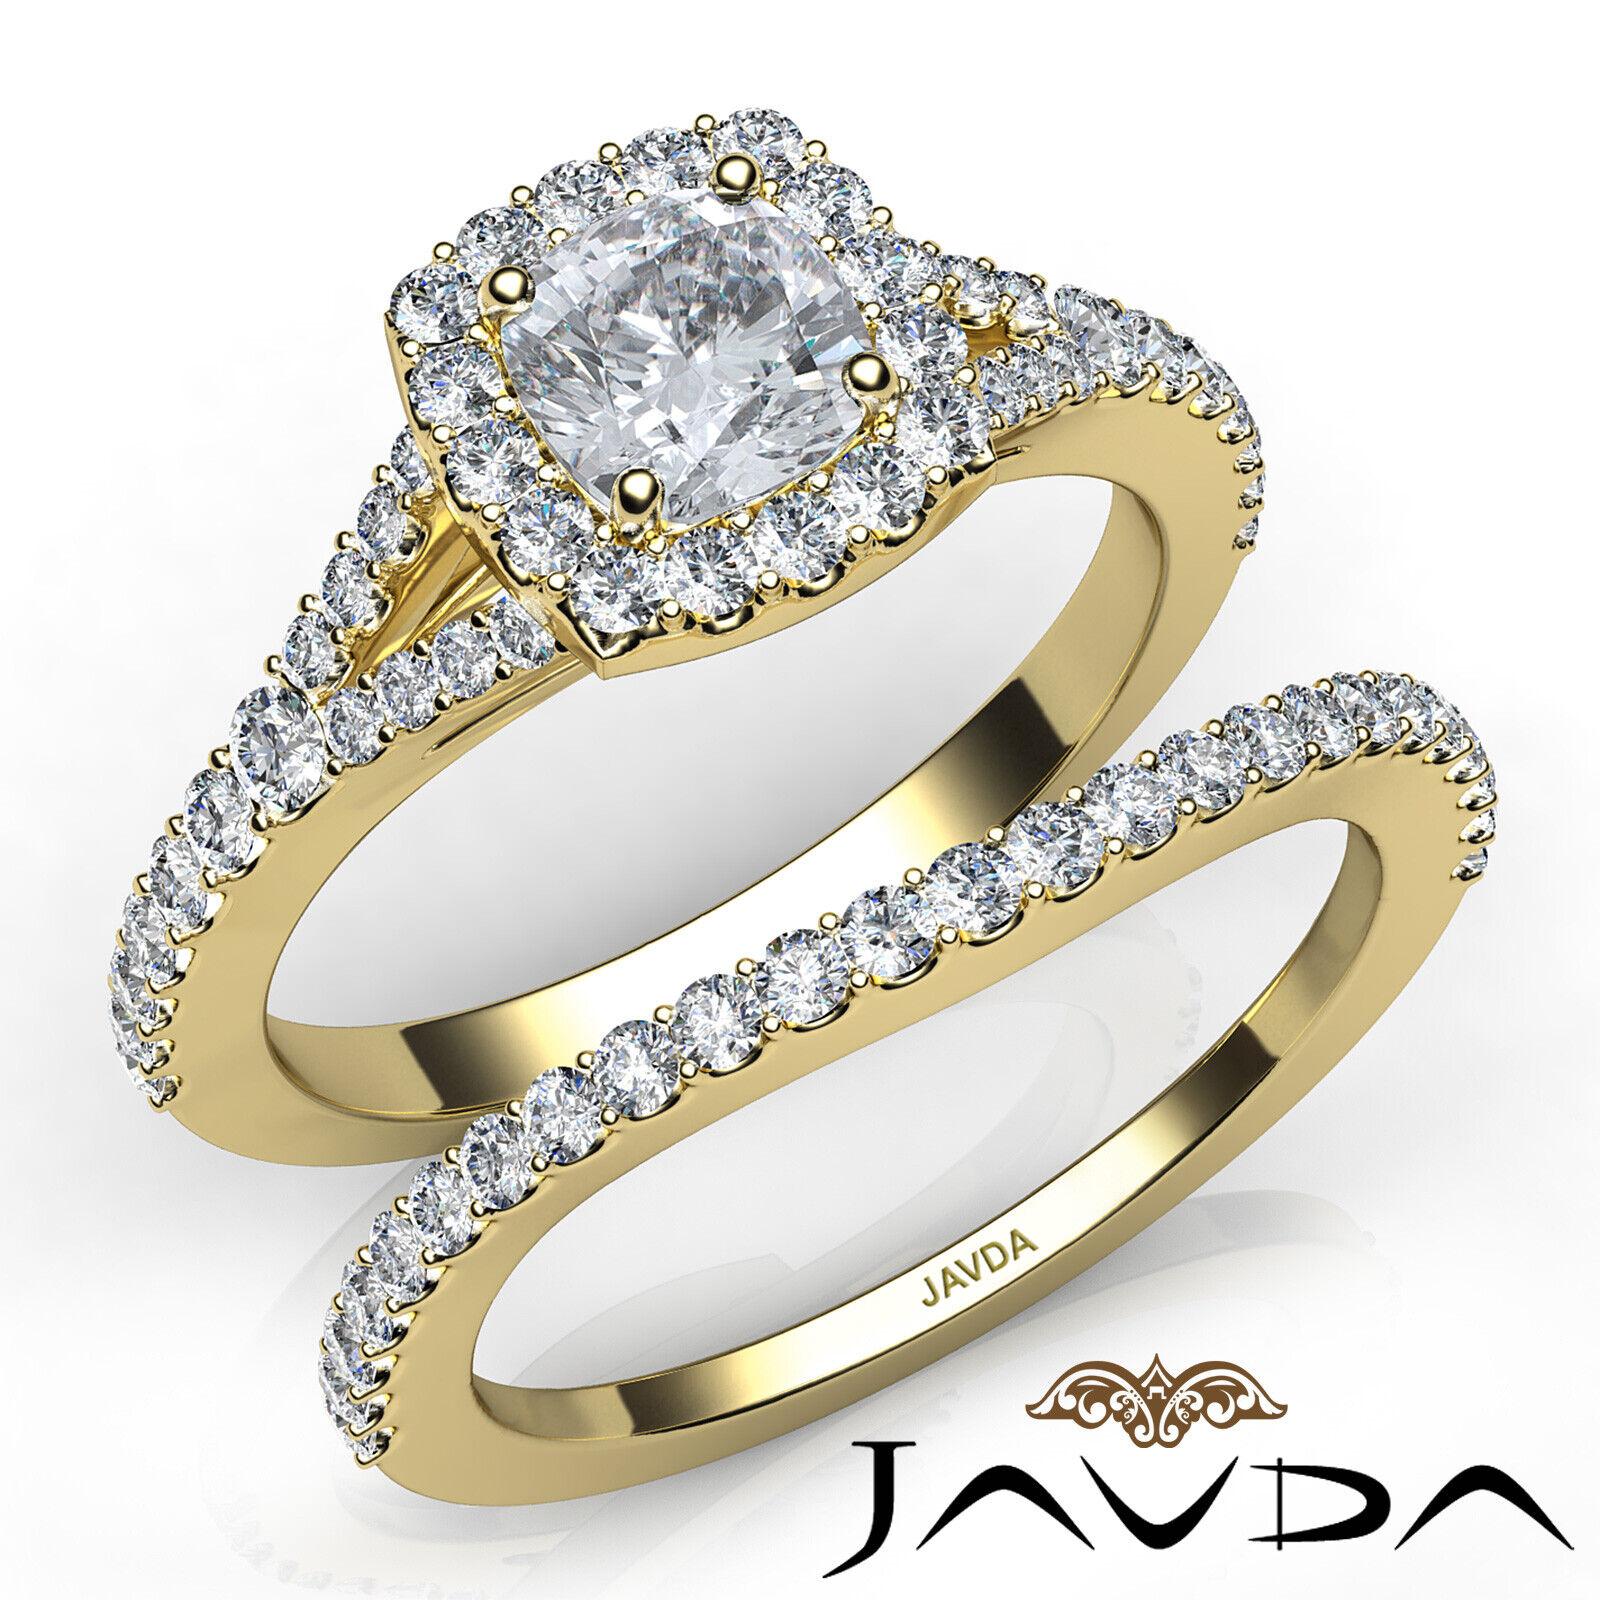 1.5ctw U Cut Pave Halo Bridal Cushion Diamond Engagement Ring GIA F-VS2 W Gold 8